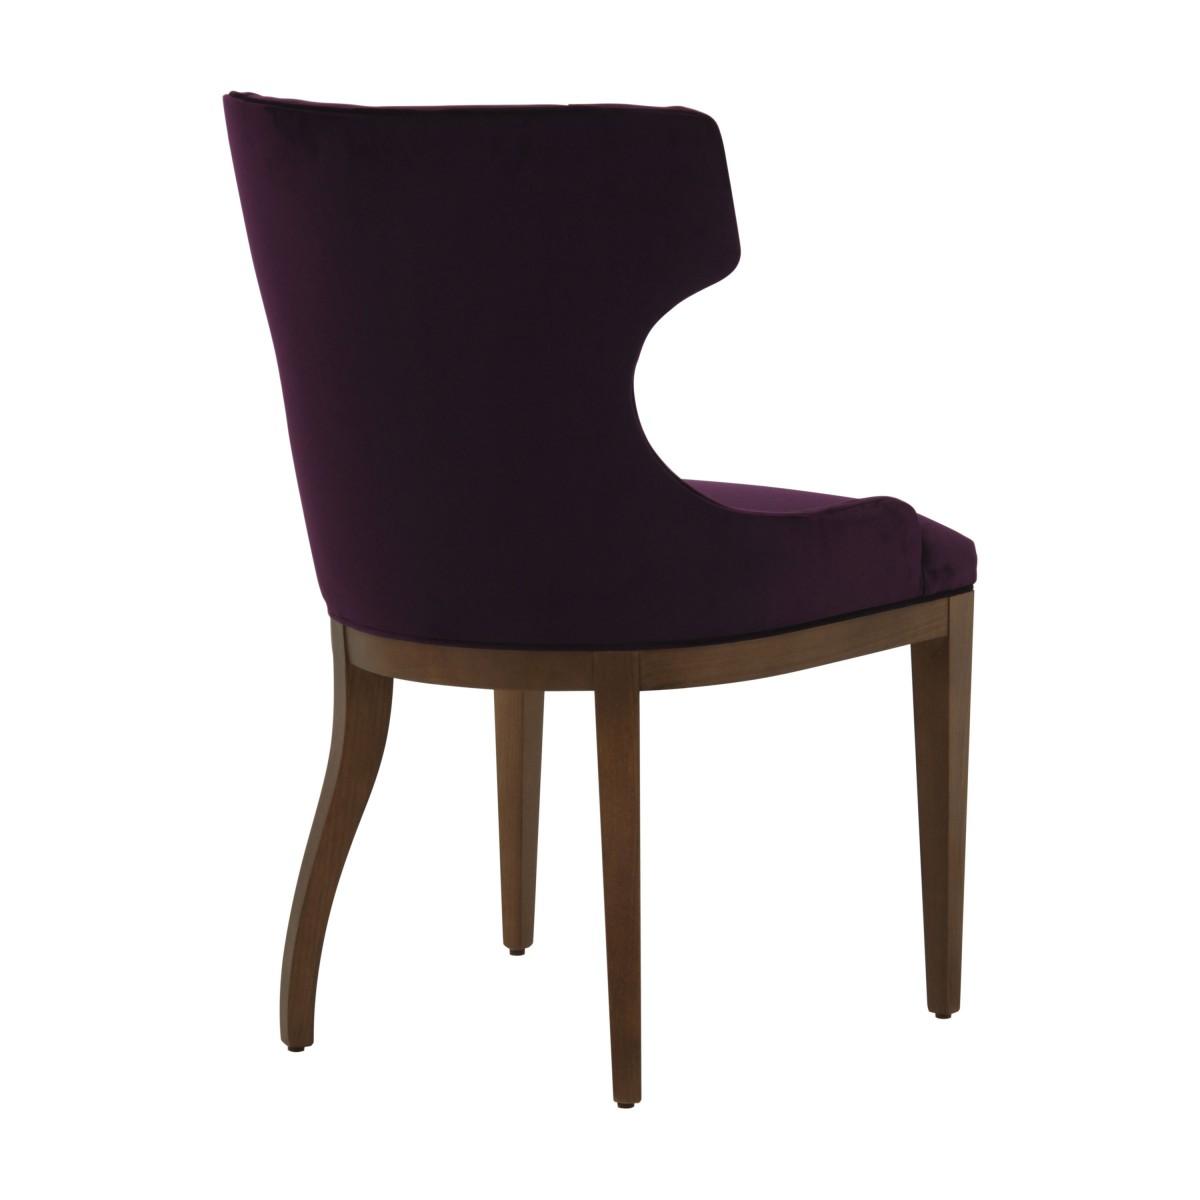 contemporary chair rachele 2 2392